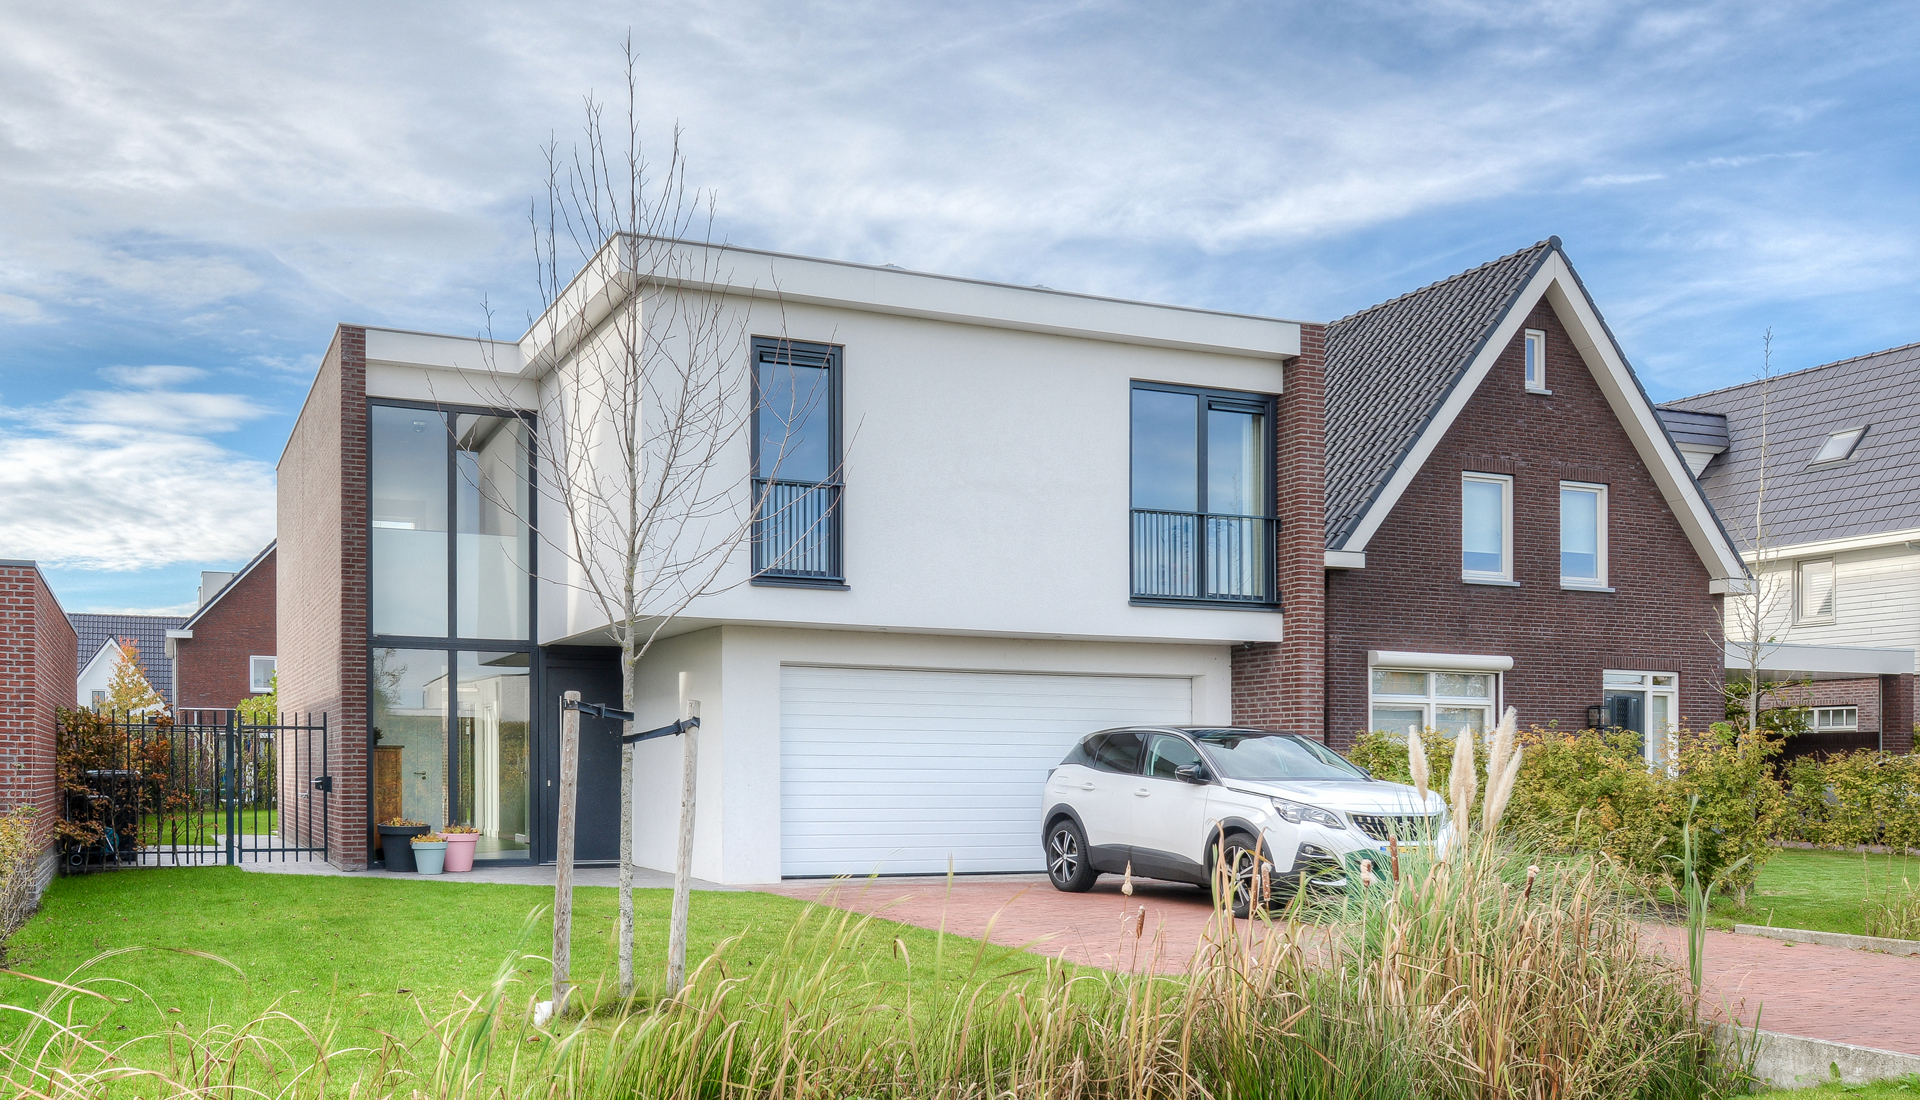 lab-R architect in Breda